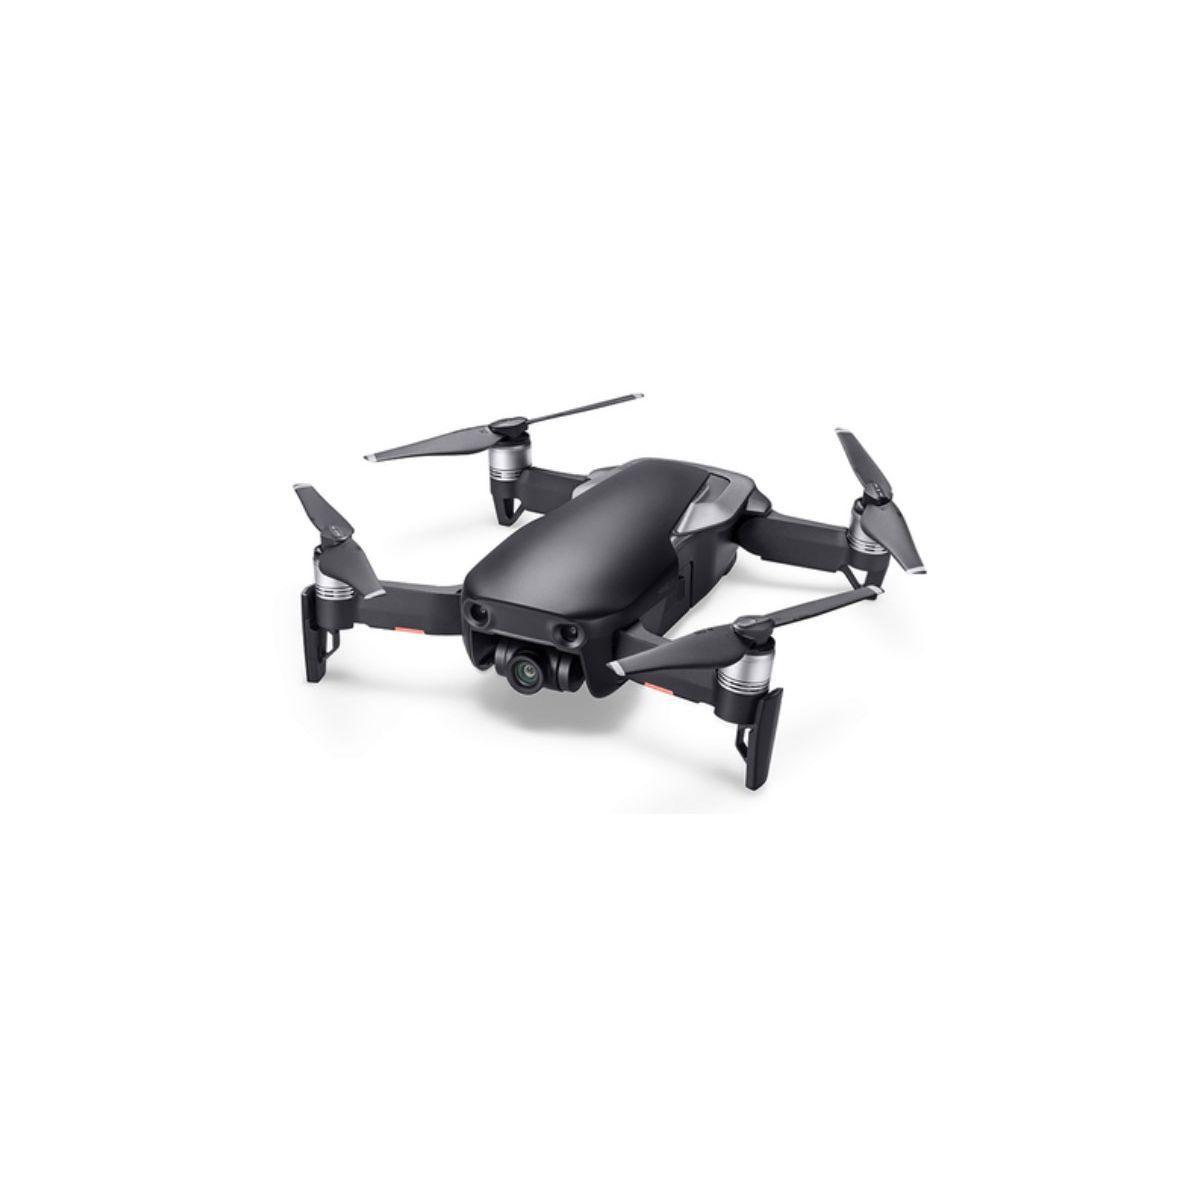 Drones dji mavic air - fly more combo ro - 7% de remise imm�diate avec le code : paques7 (photo)